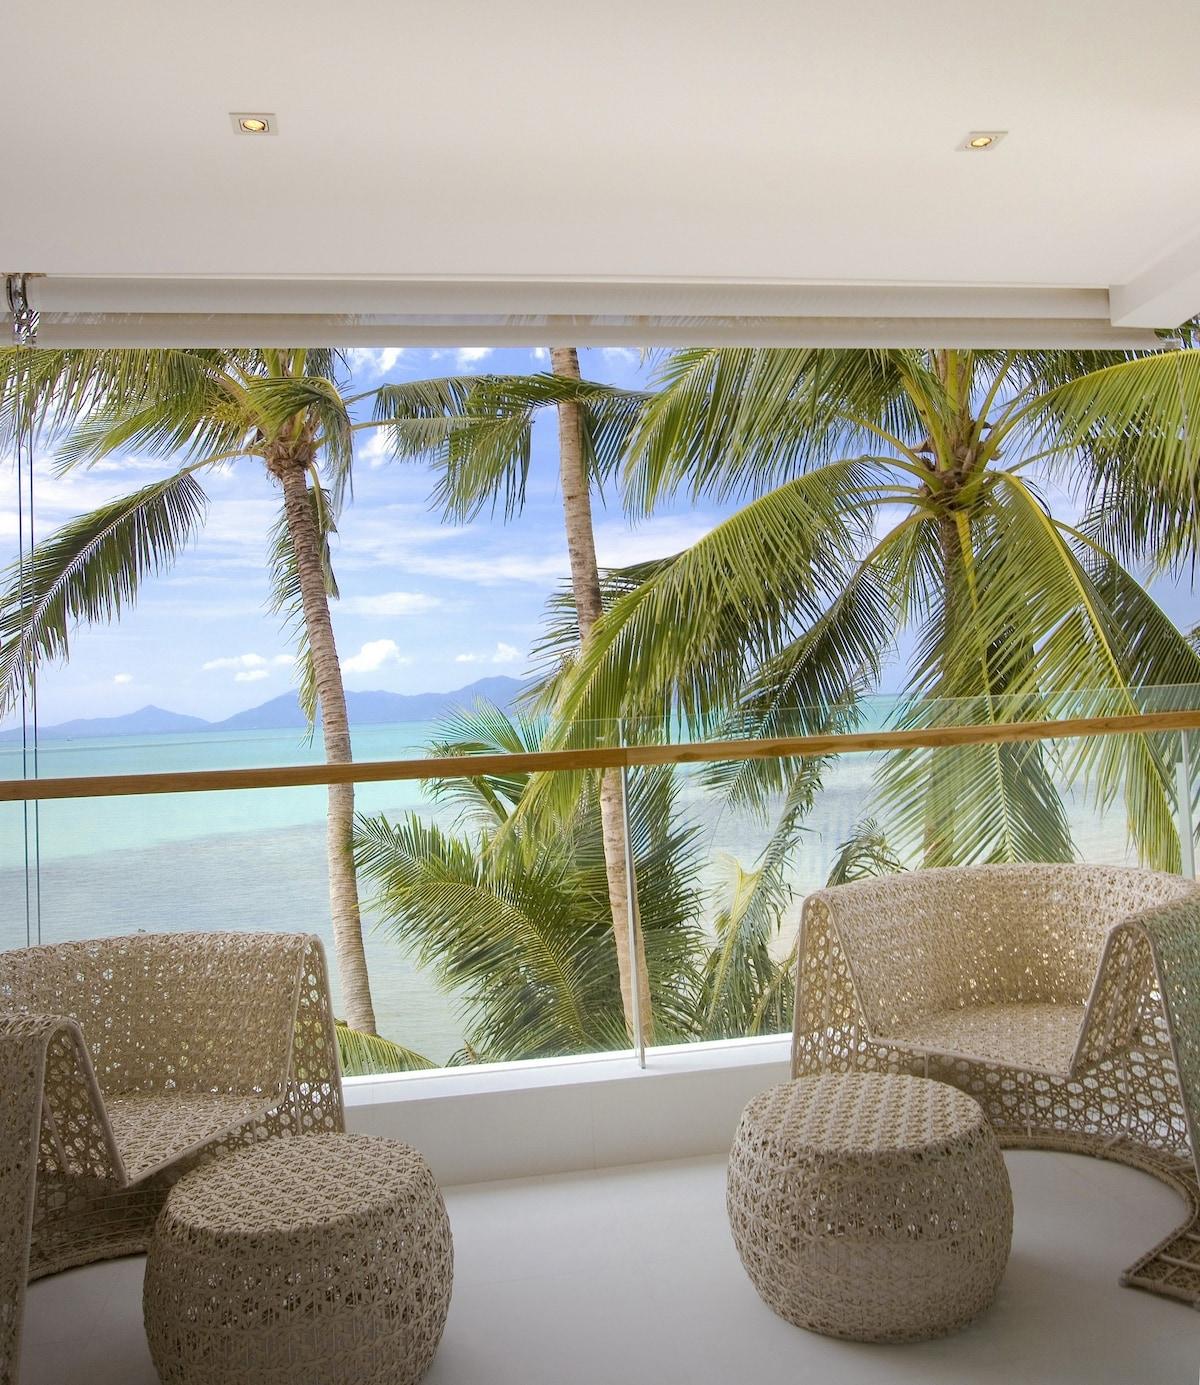 Panu, Luxury Beachfront Apartments